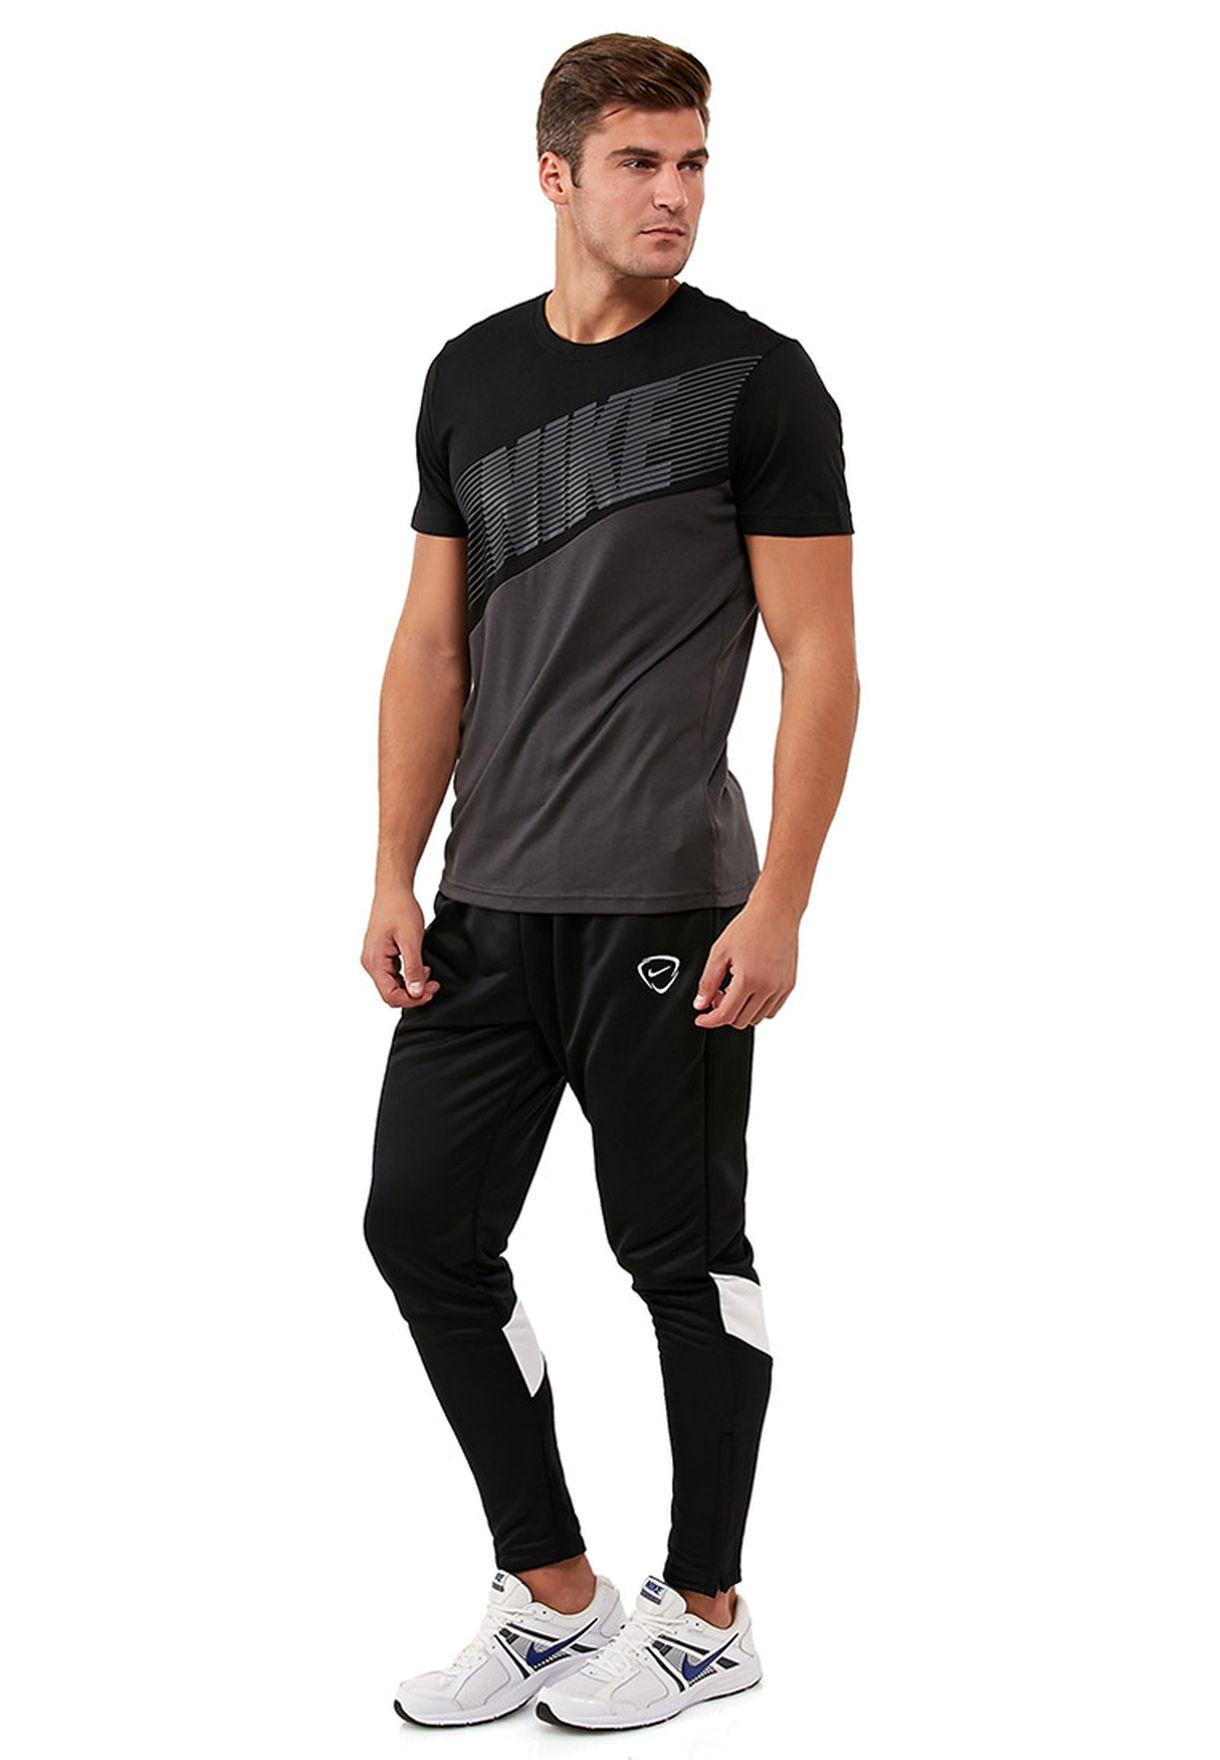 187aac80f1 Academy Tech Knit Pants